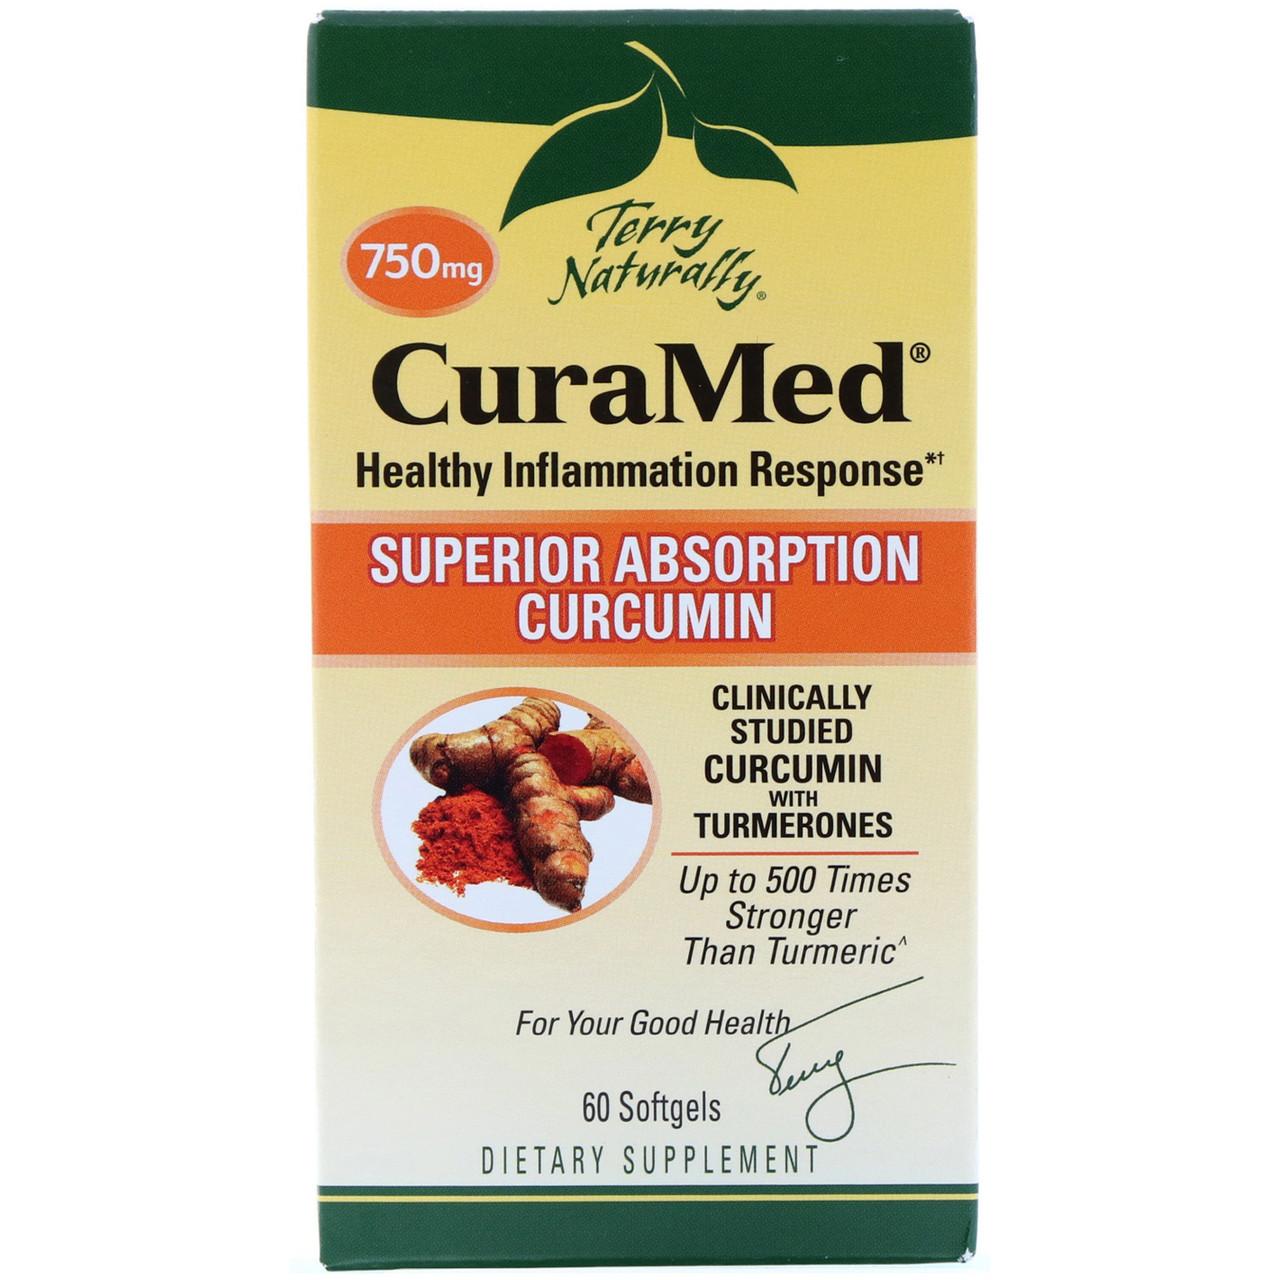 Курамед против воспаления CuraMed, 750 мг, EuroPharma, 60 капсул